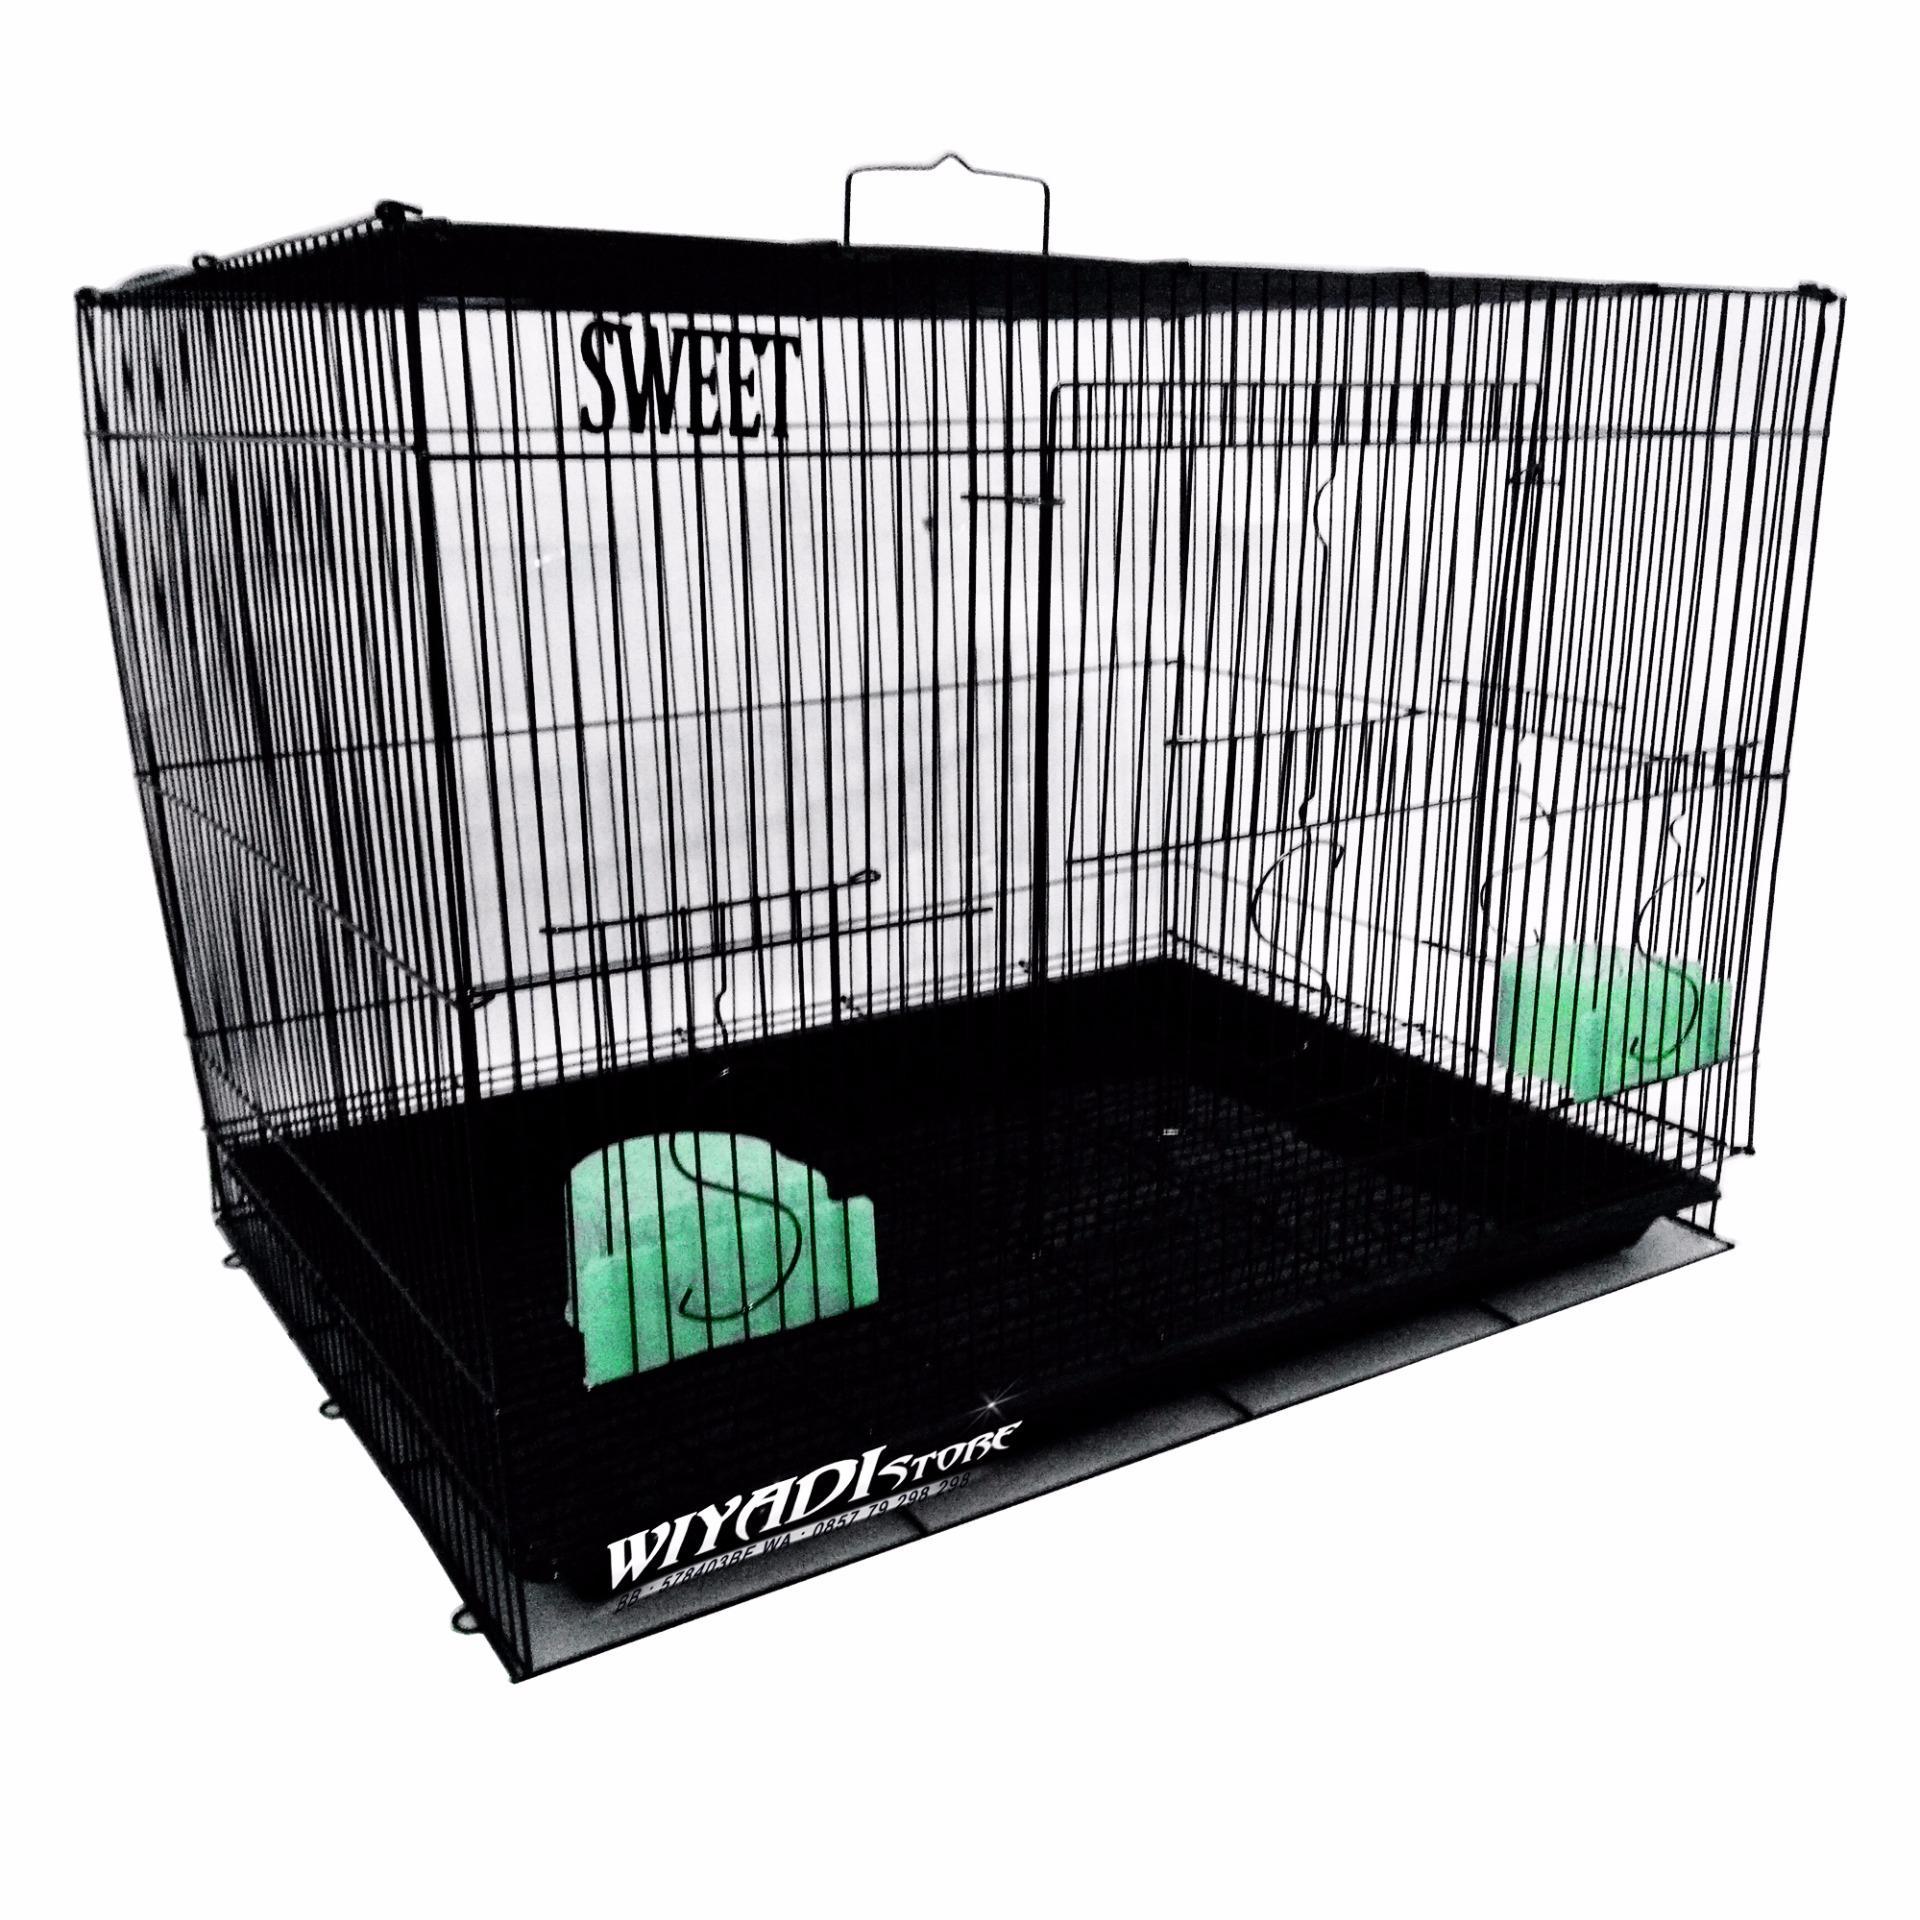 WiyadiStore - [K12] Kandang Kucing Besi Lipat Besar 60P - Black